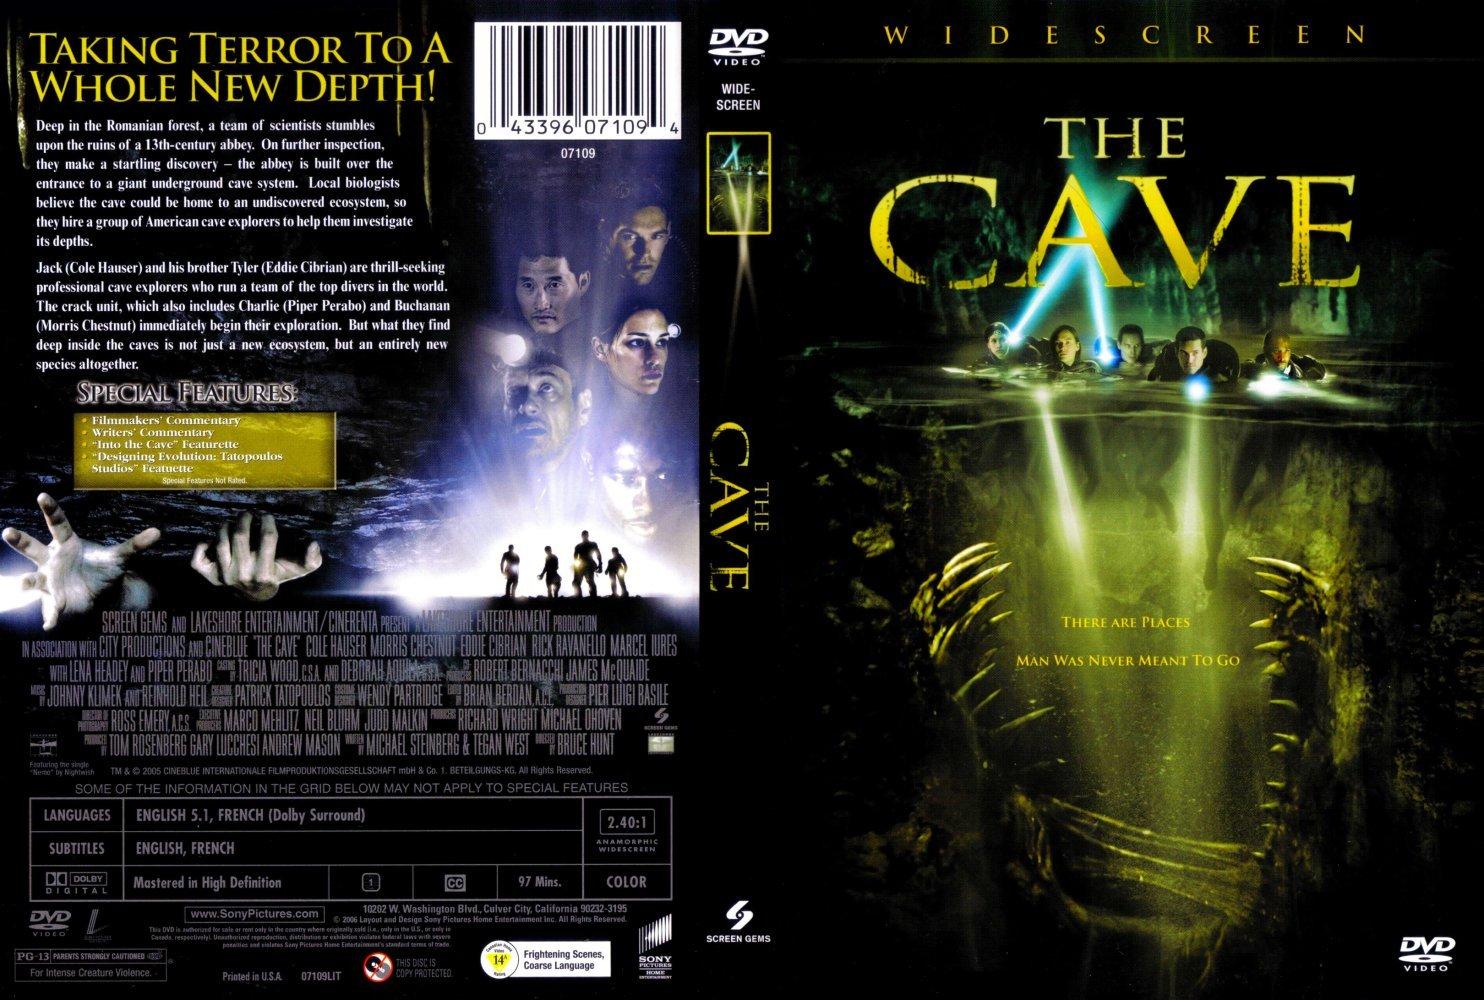 The Cave 2005 1080p JPN Blu-ray MPEG-2 LPCM 5.1 - tehPARADOX